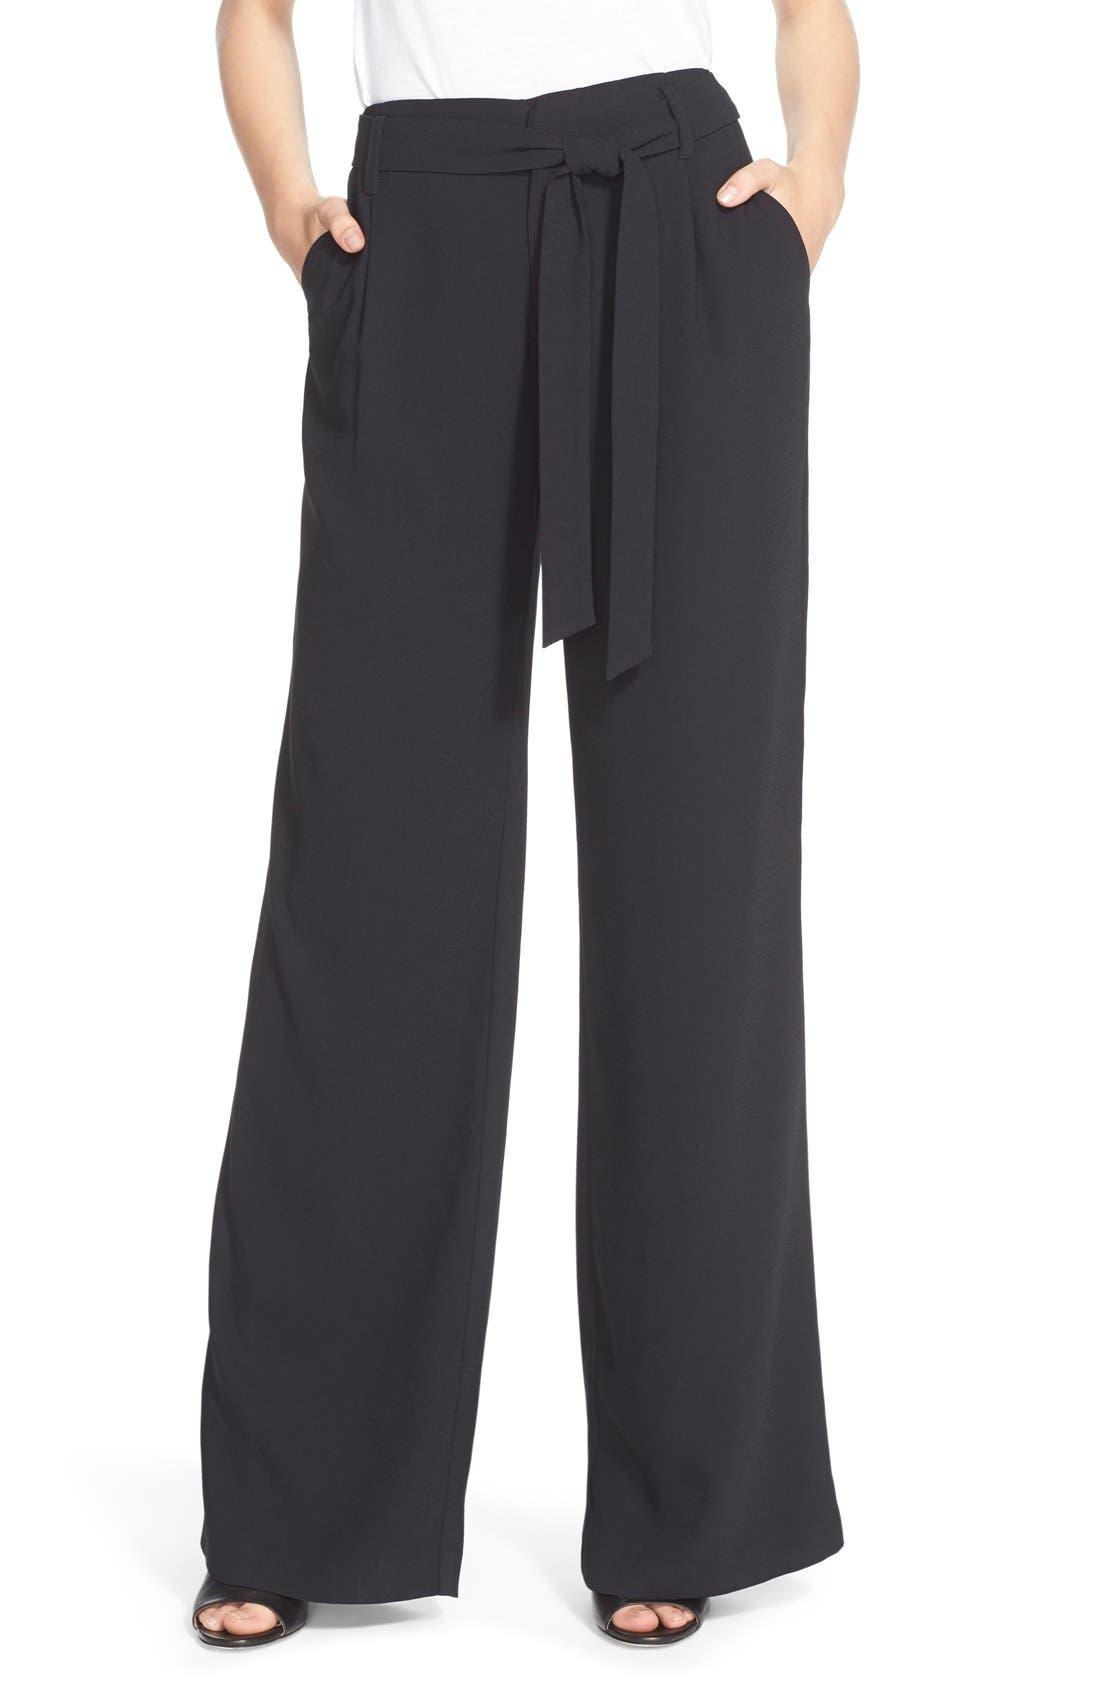 Alternate Image 1 Selected - Joie'Calvina' Wide Leg Pants